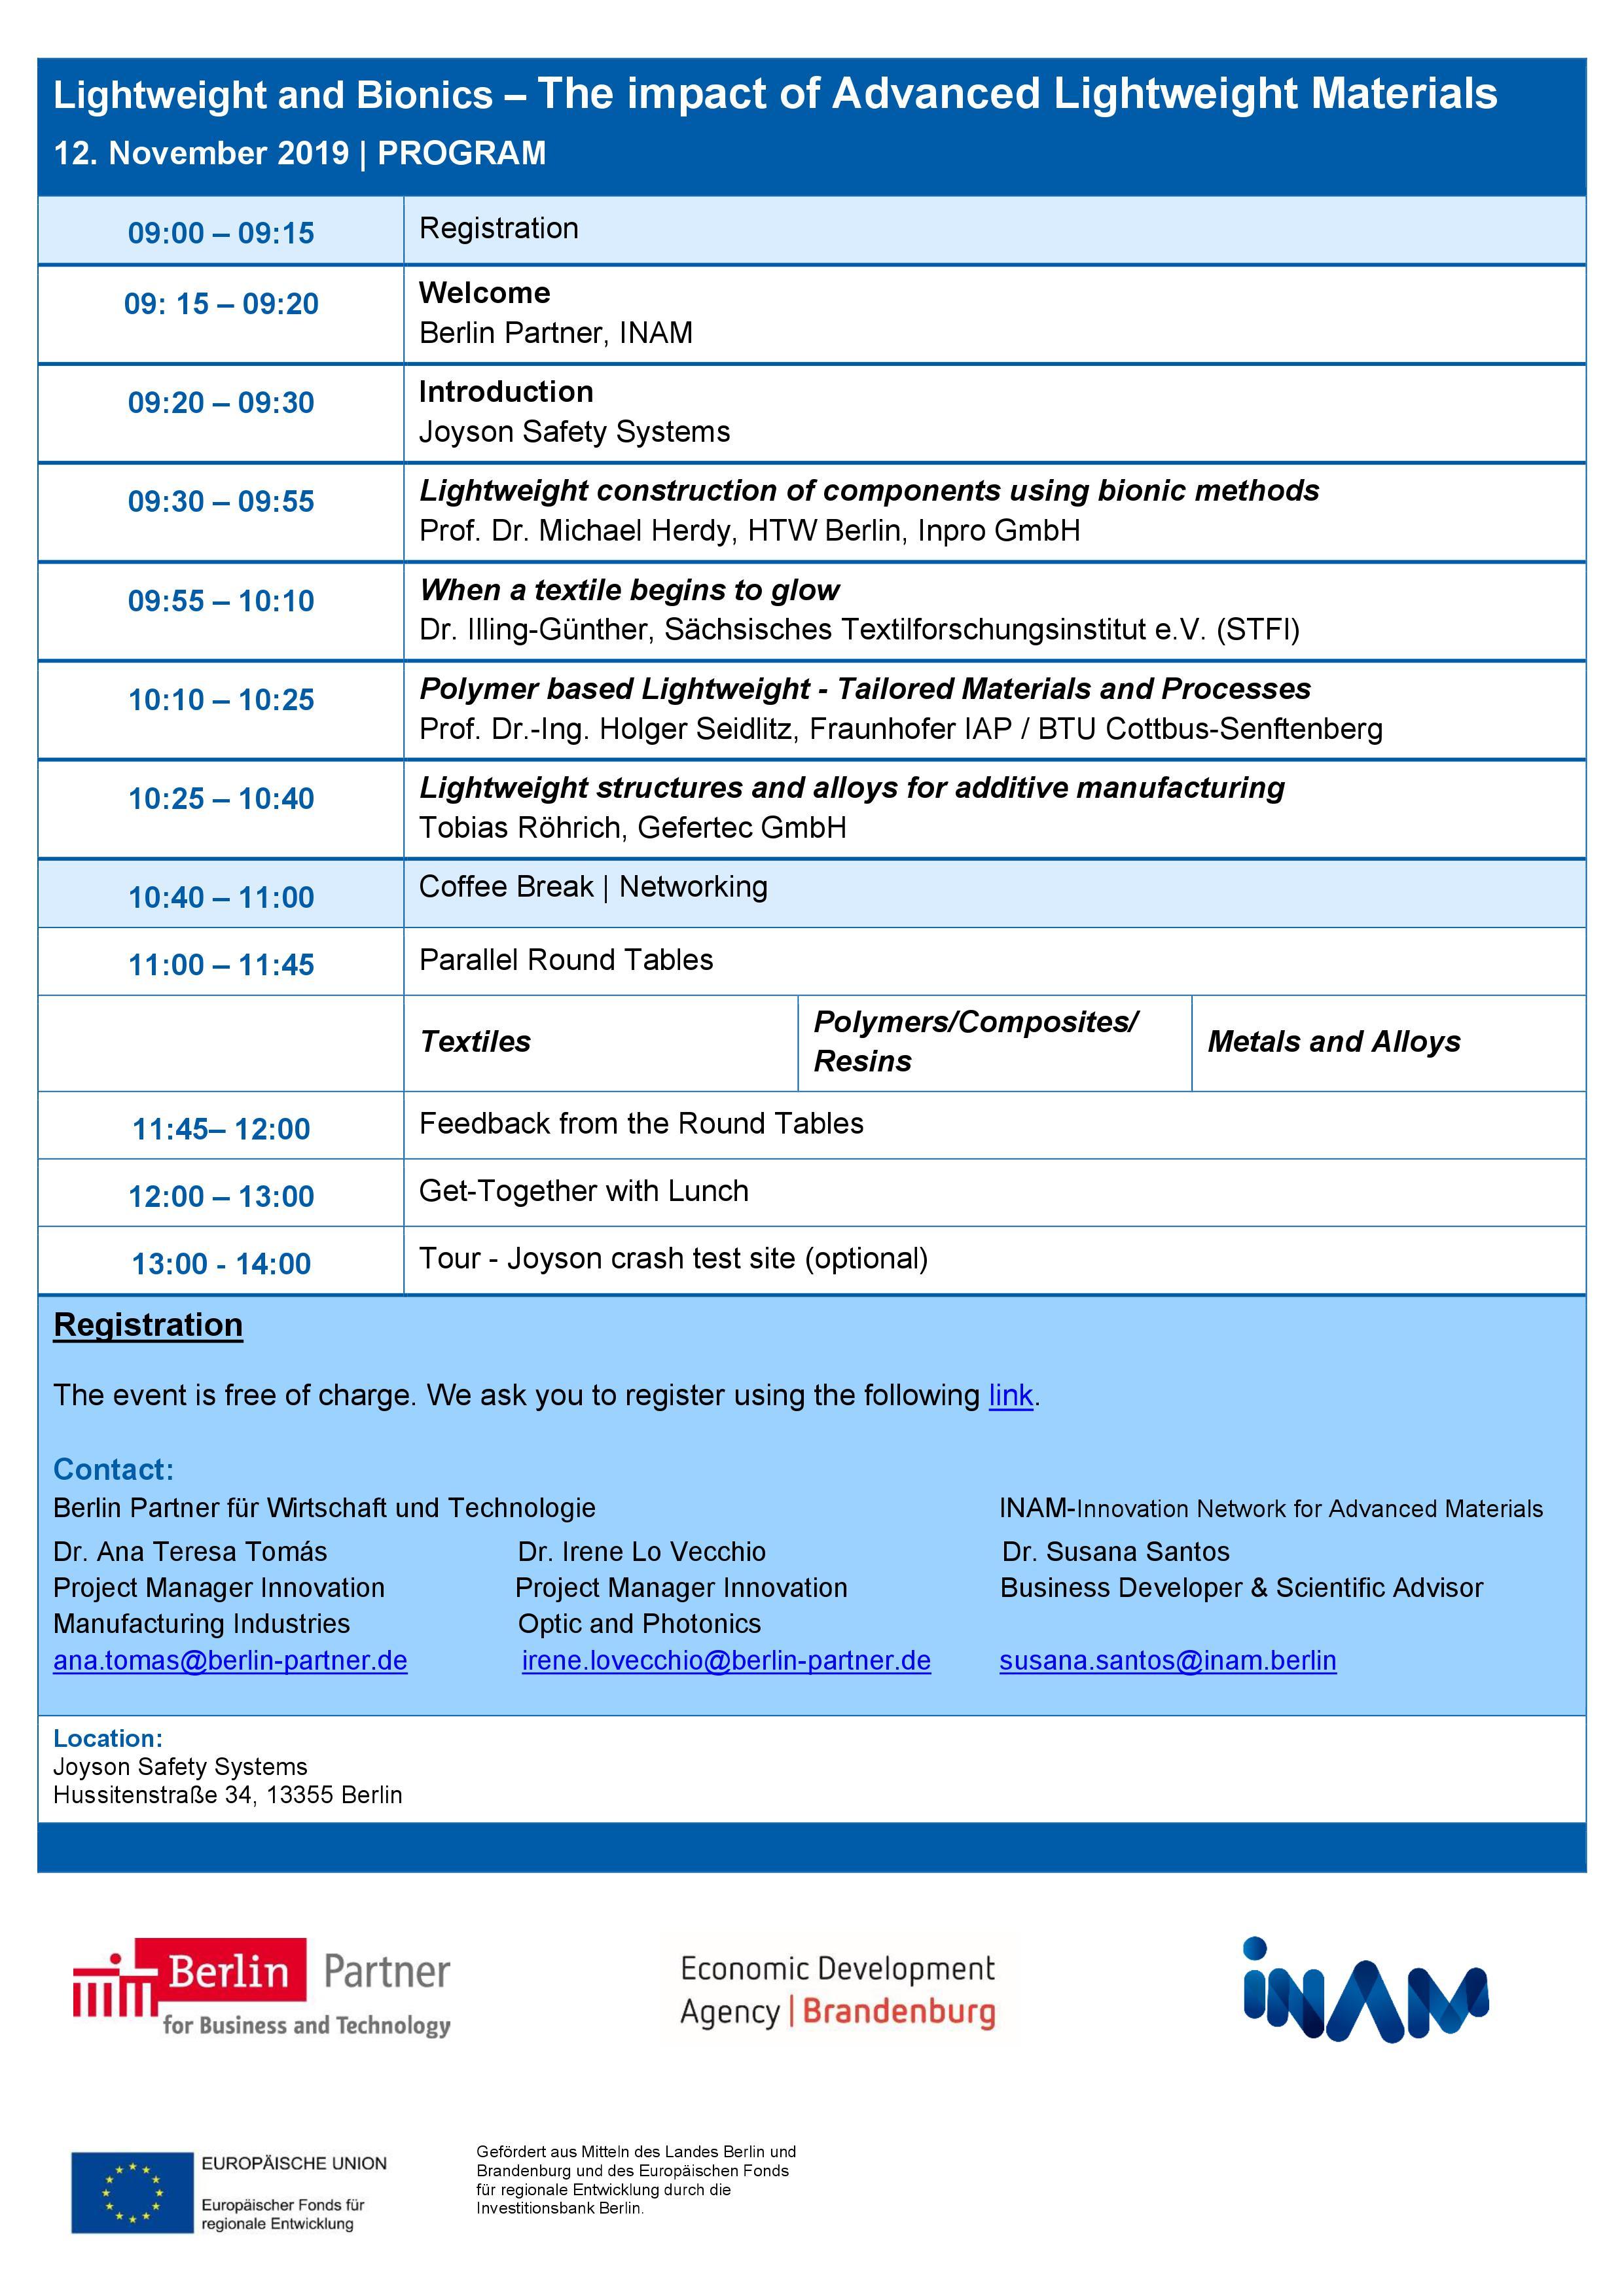 Program 12 November 2019